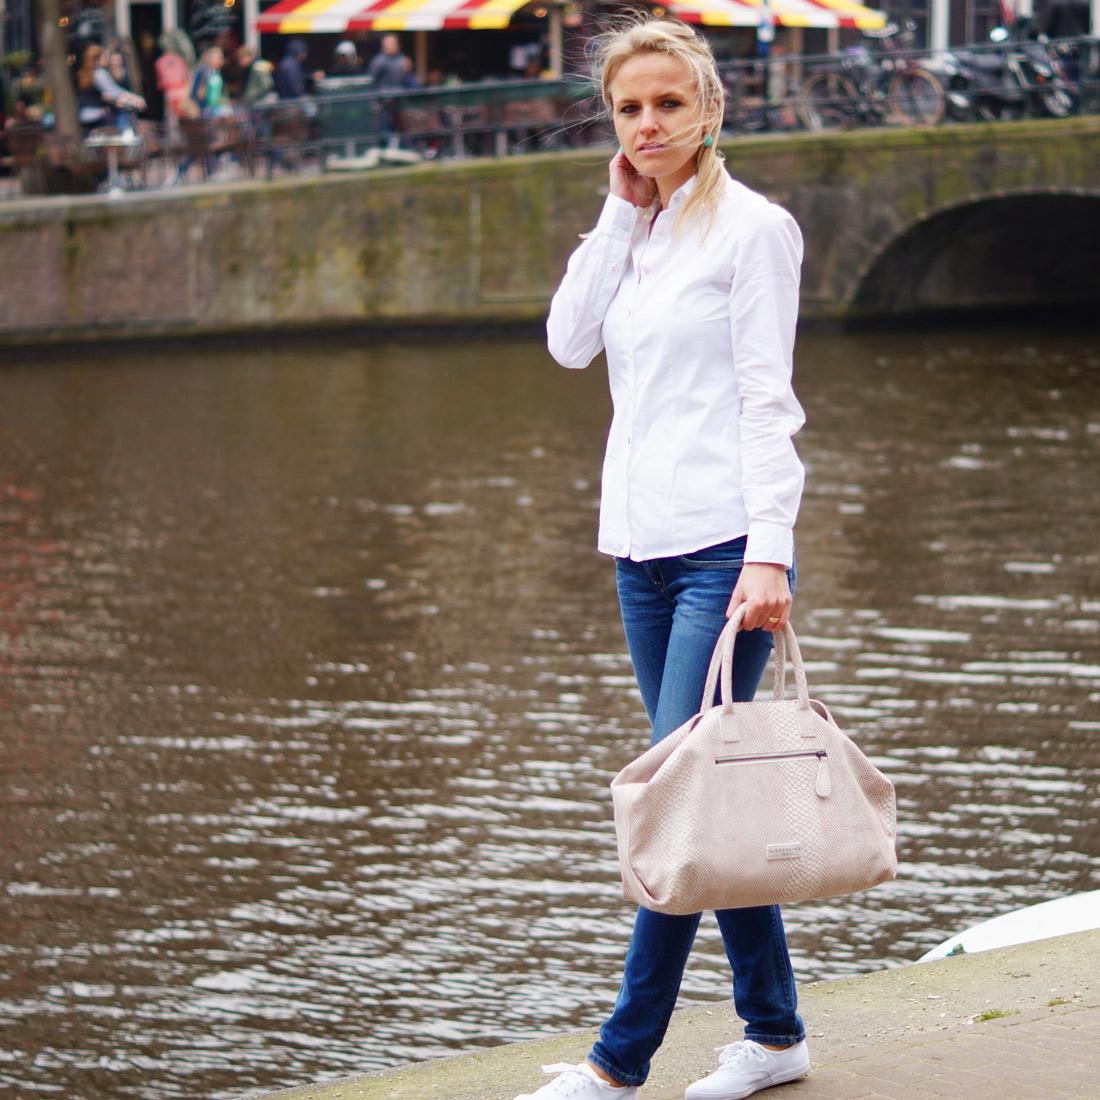 bag at you fashion blog liebeskind berlin maxime handbag streetstyle amsterdam bag at you. Black Bedroom Furniture Sets. Home Design Ideas